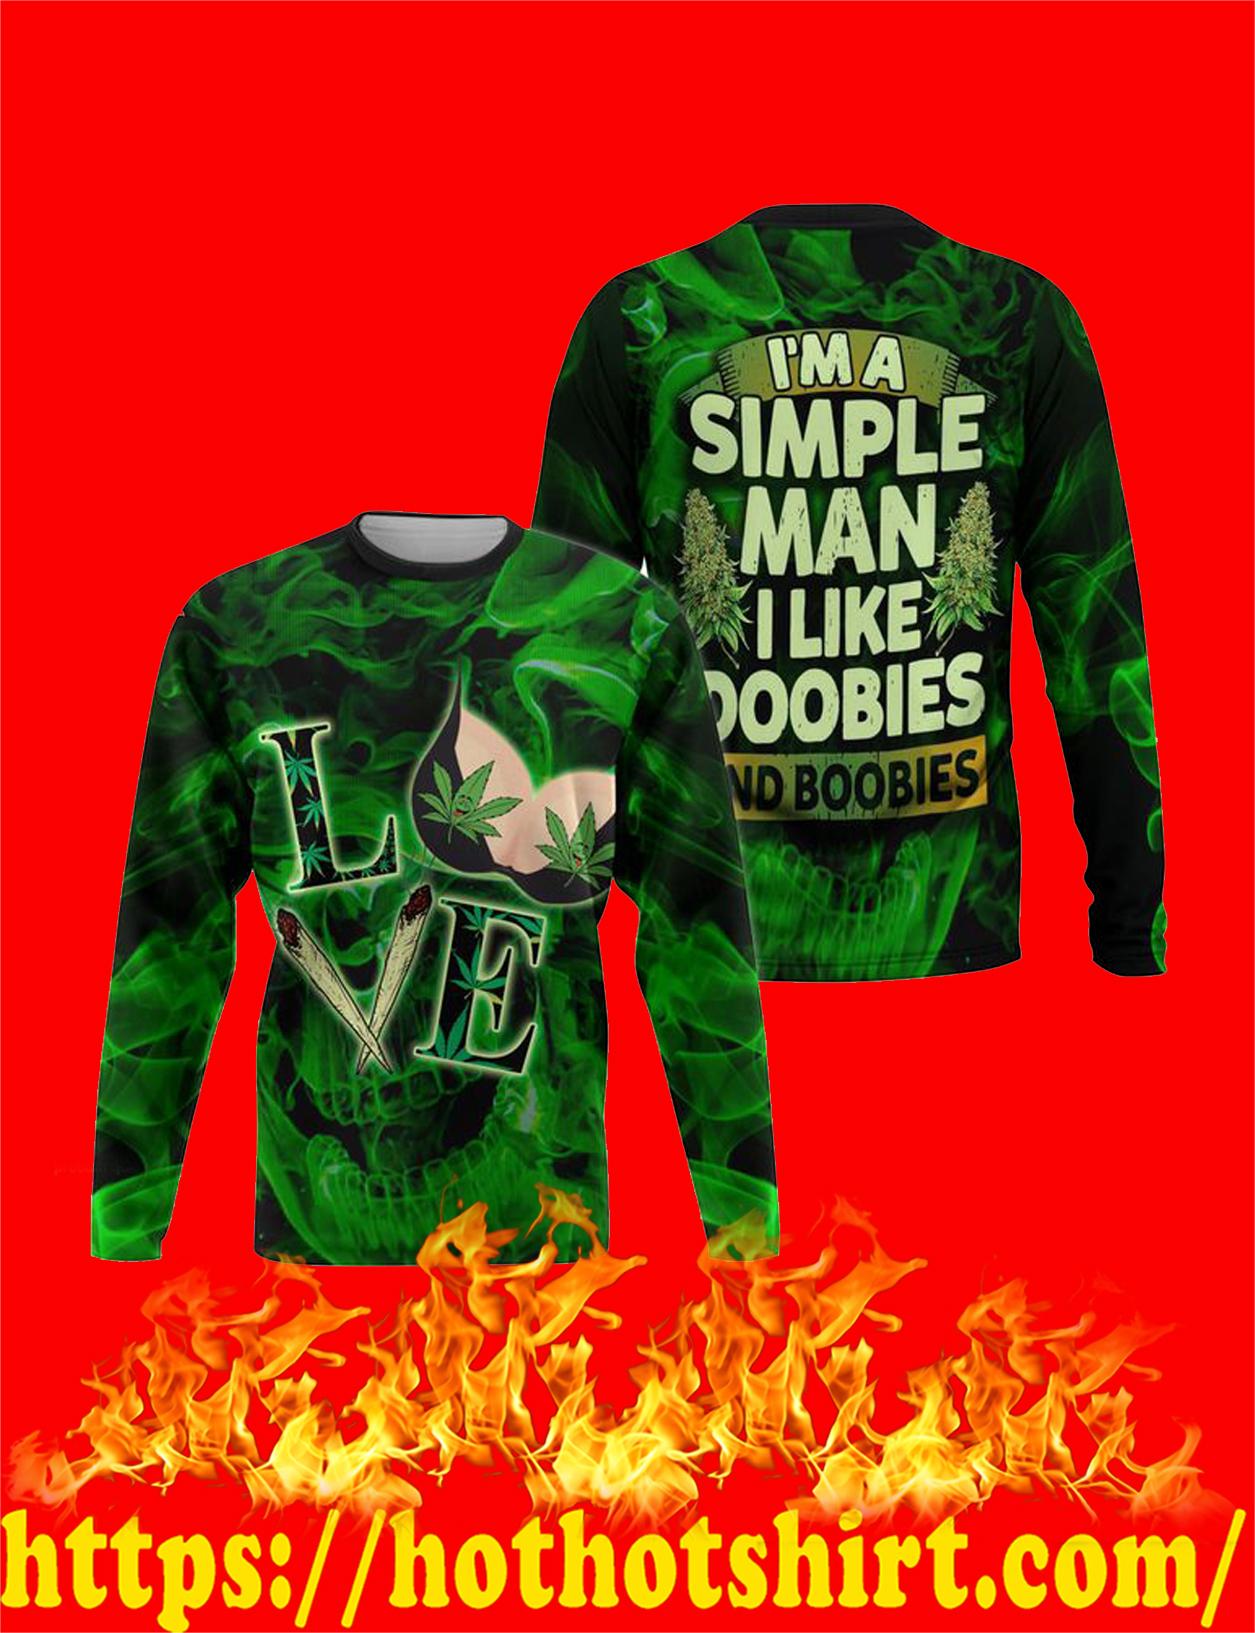 I'm a simple man i like doobies and boobies 3d all over print sweatshirt